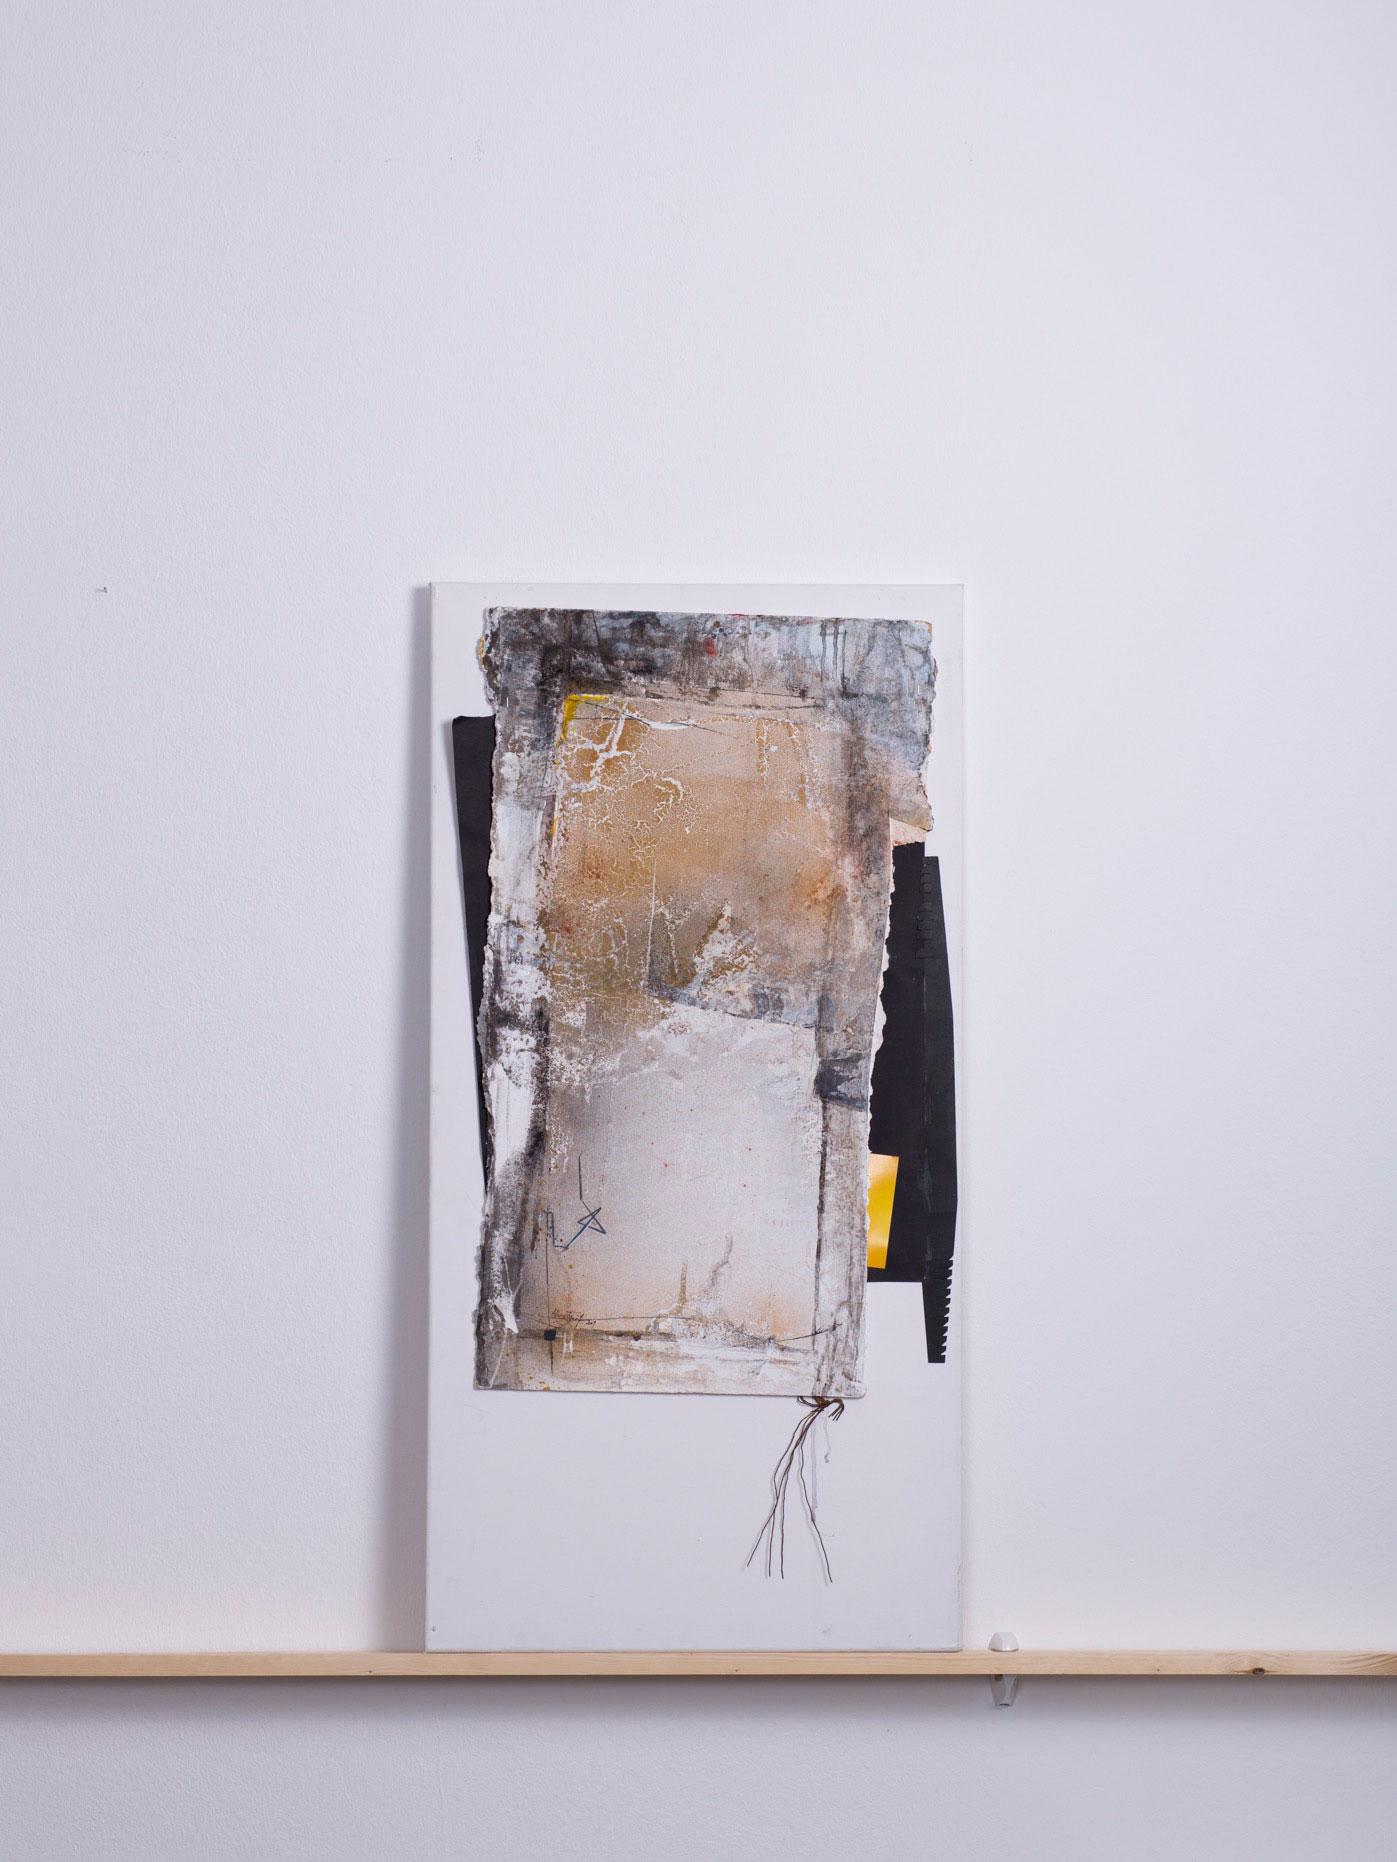 kokel-au, 2009 - 50x100 cm, <br>Acryl auf Abrisskarton, Papier, Draht auf Leinwand